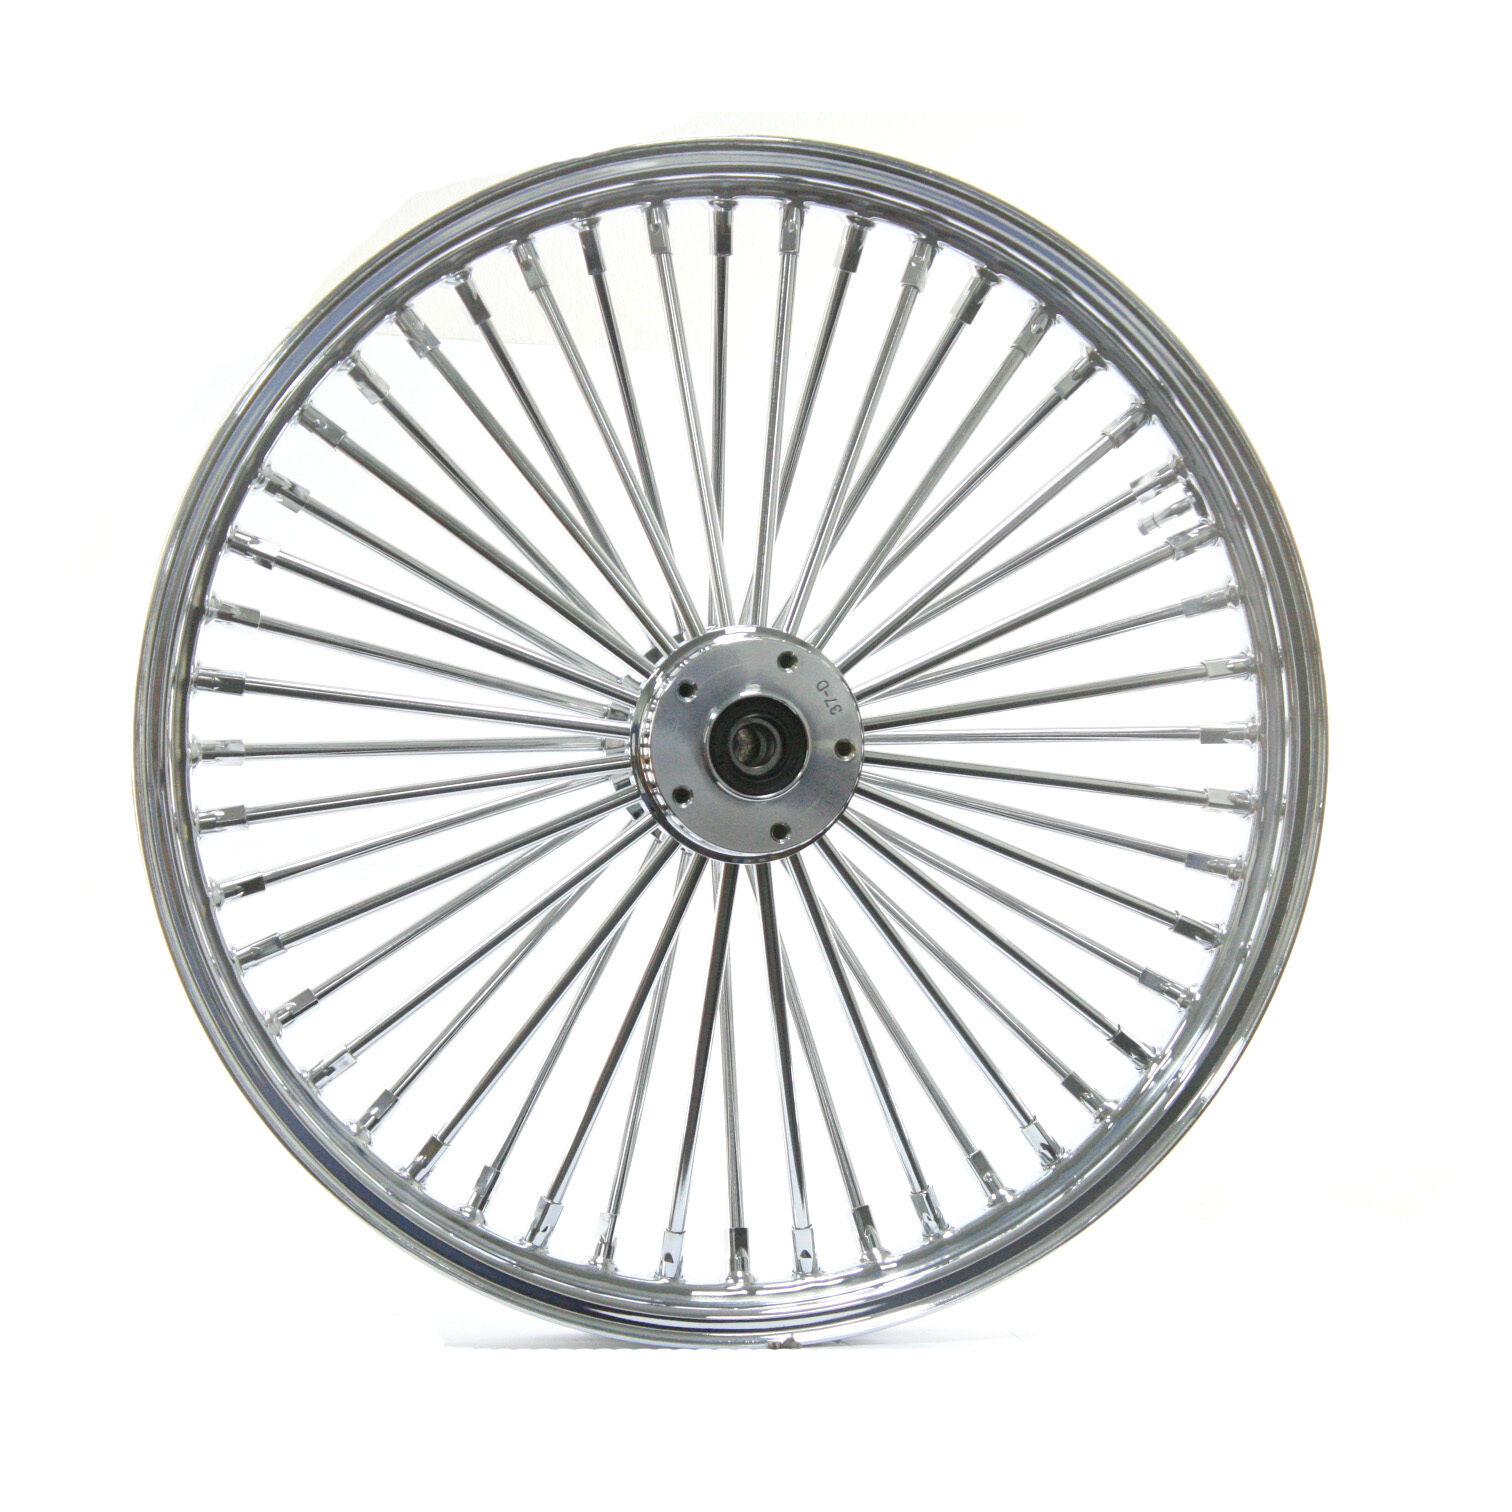 fat spoke 21 u0026quot  front wheel chrome 21 x 3 5 harley flhr road